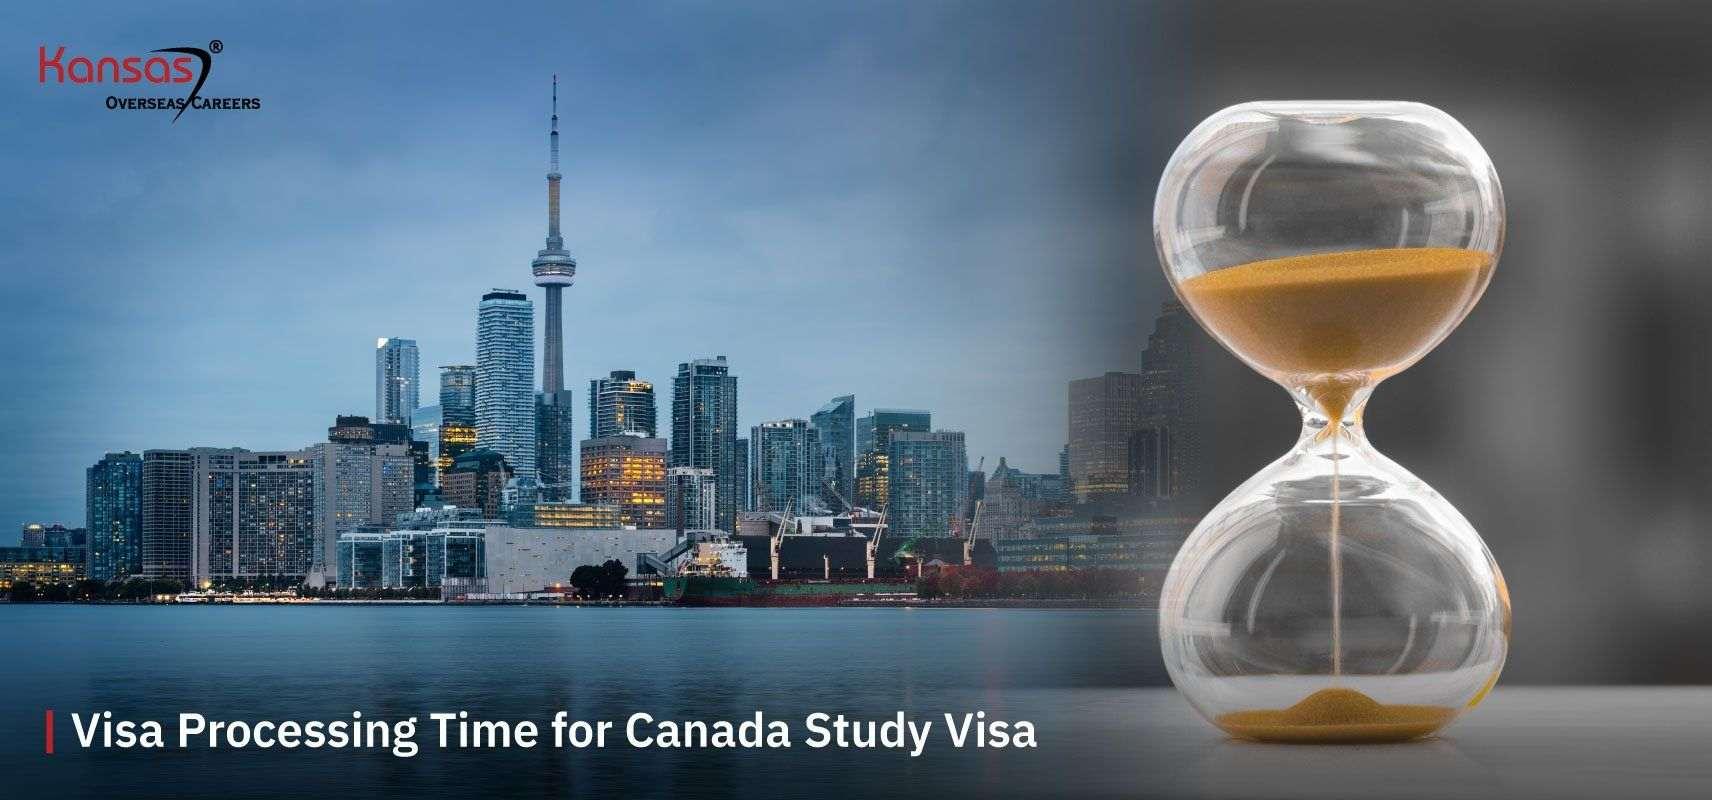 Visa-Processing-Time-for-Canada-Study-Visa